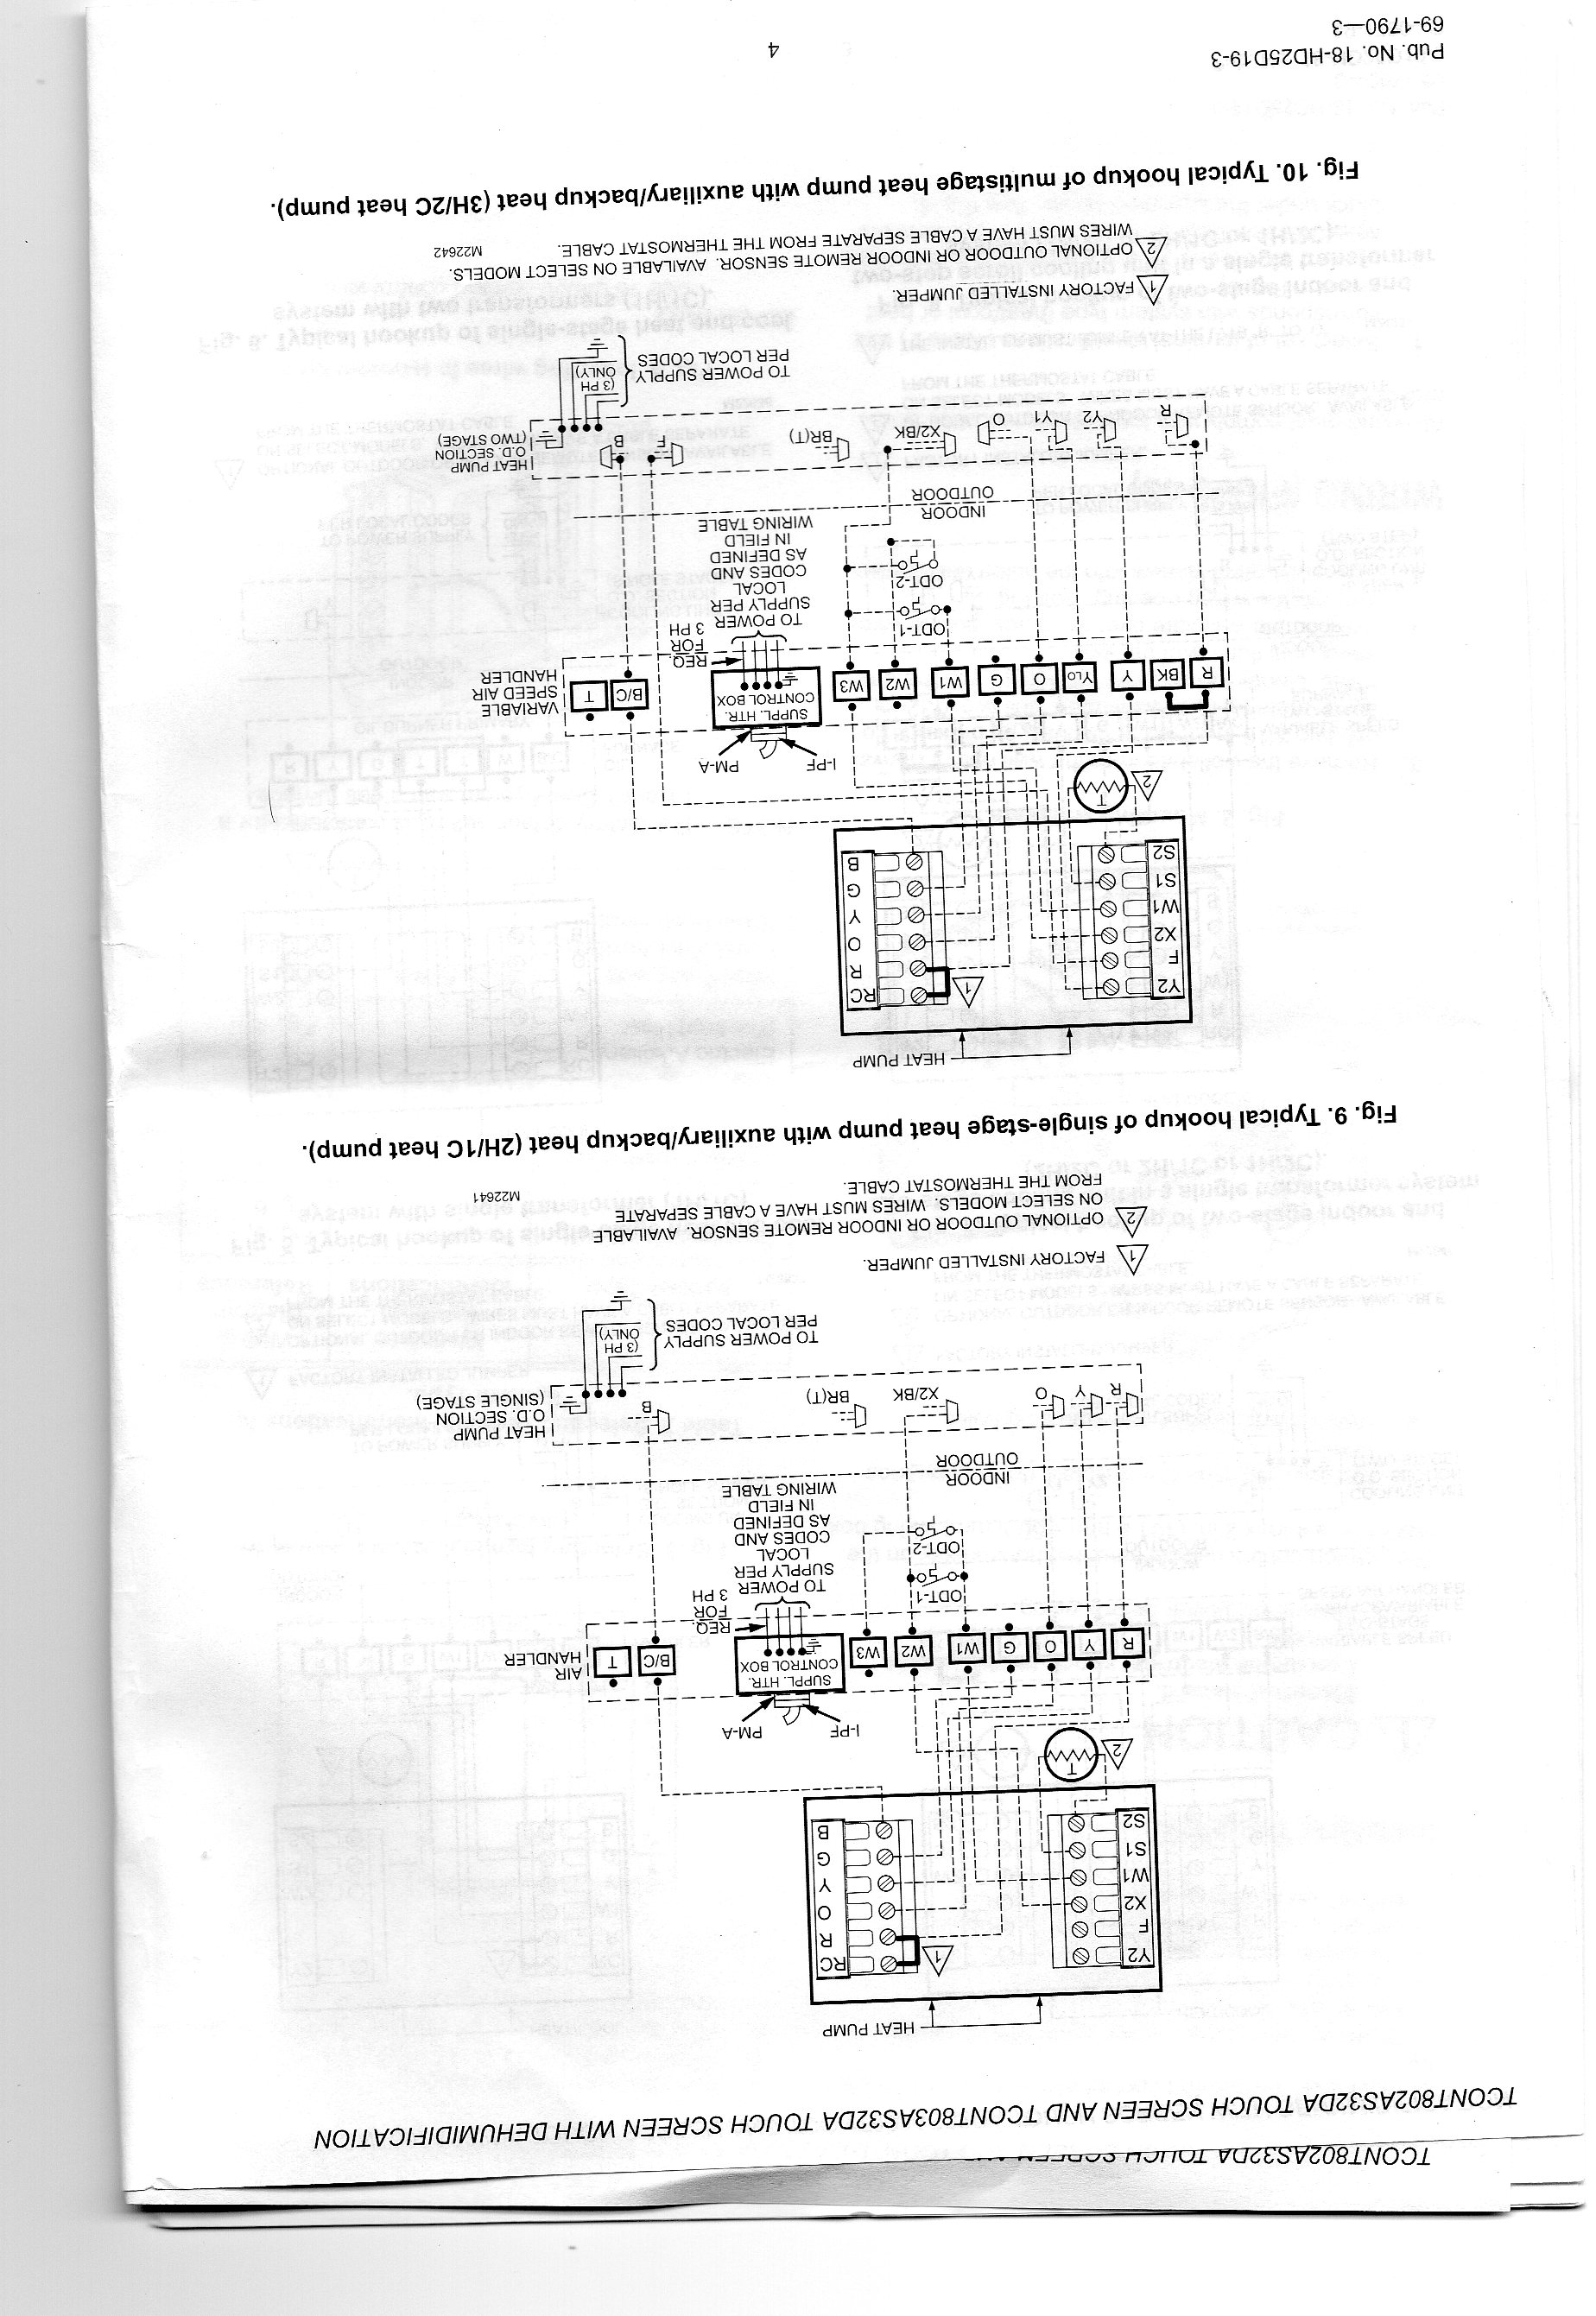 trane weathertron baystat 239 thermostat wiring diagram genset xv90 diagrams